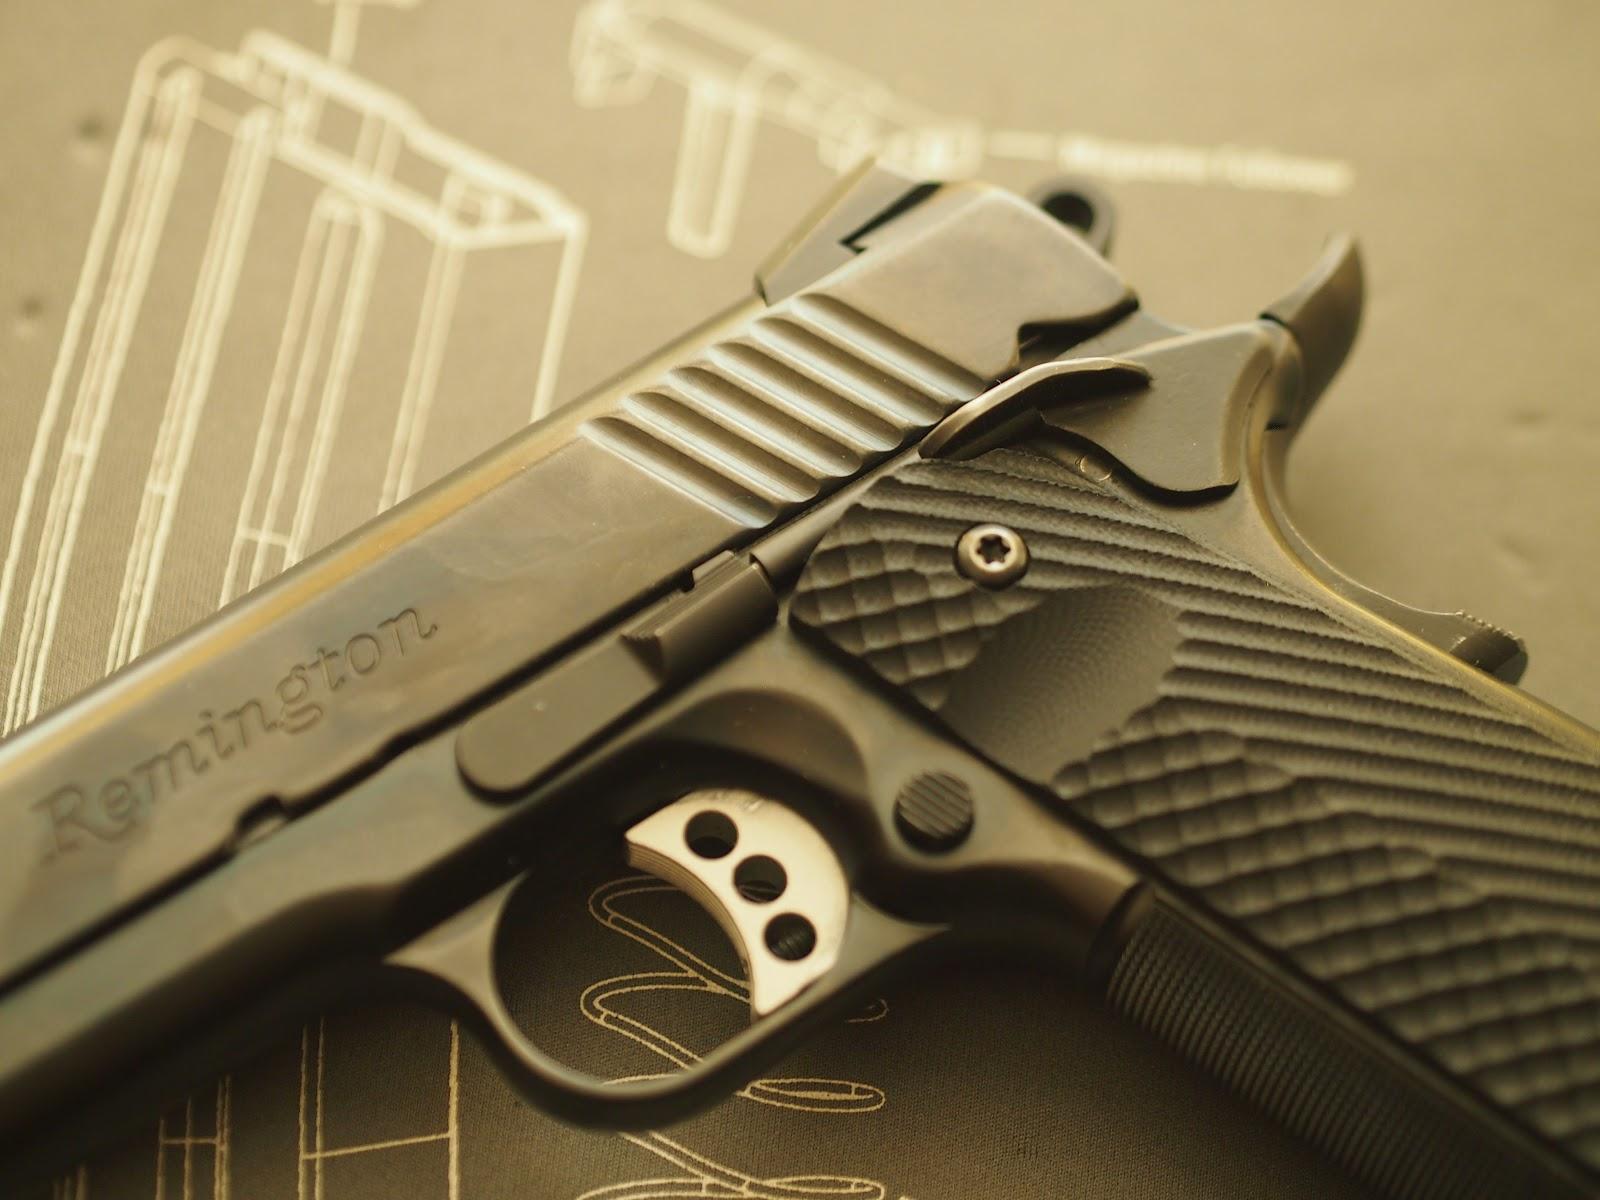 Mister Donut's Firearms Blog: Remington R1 Carry